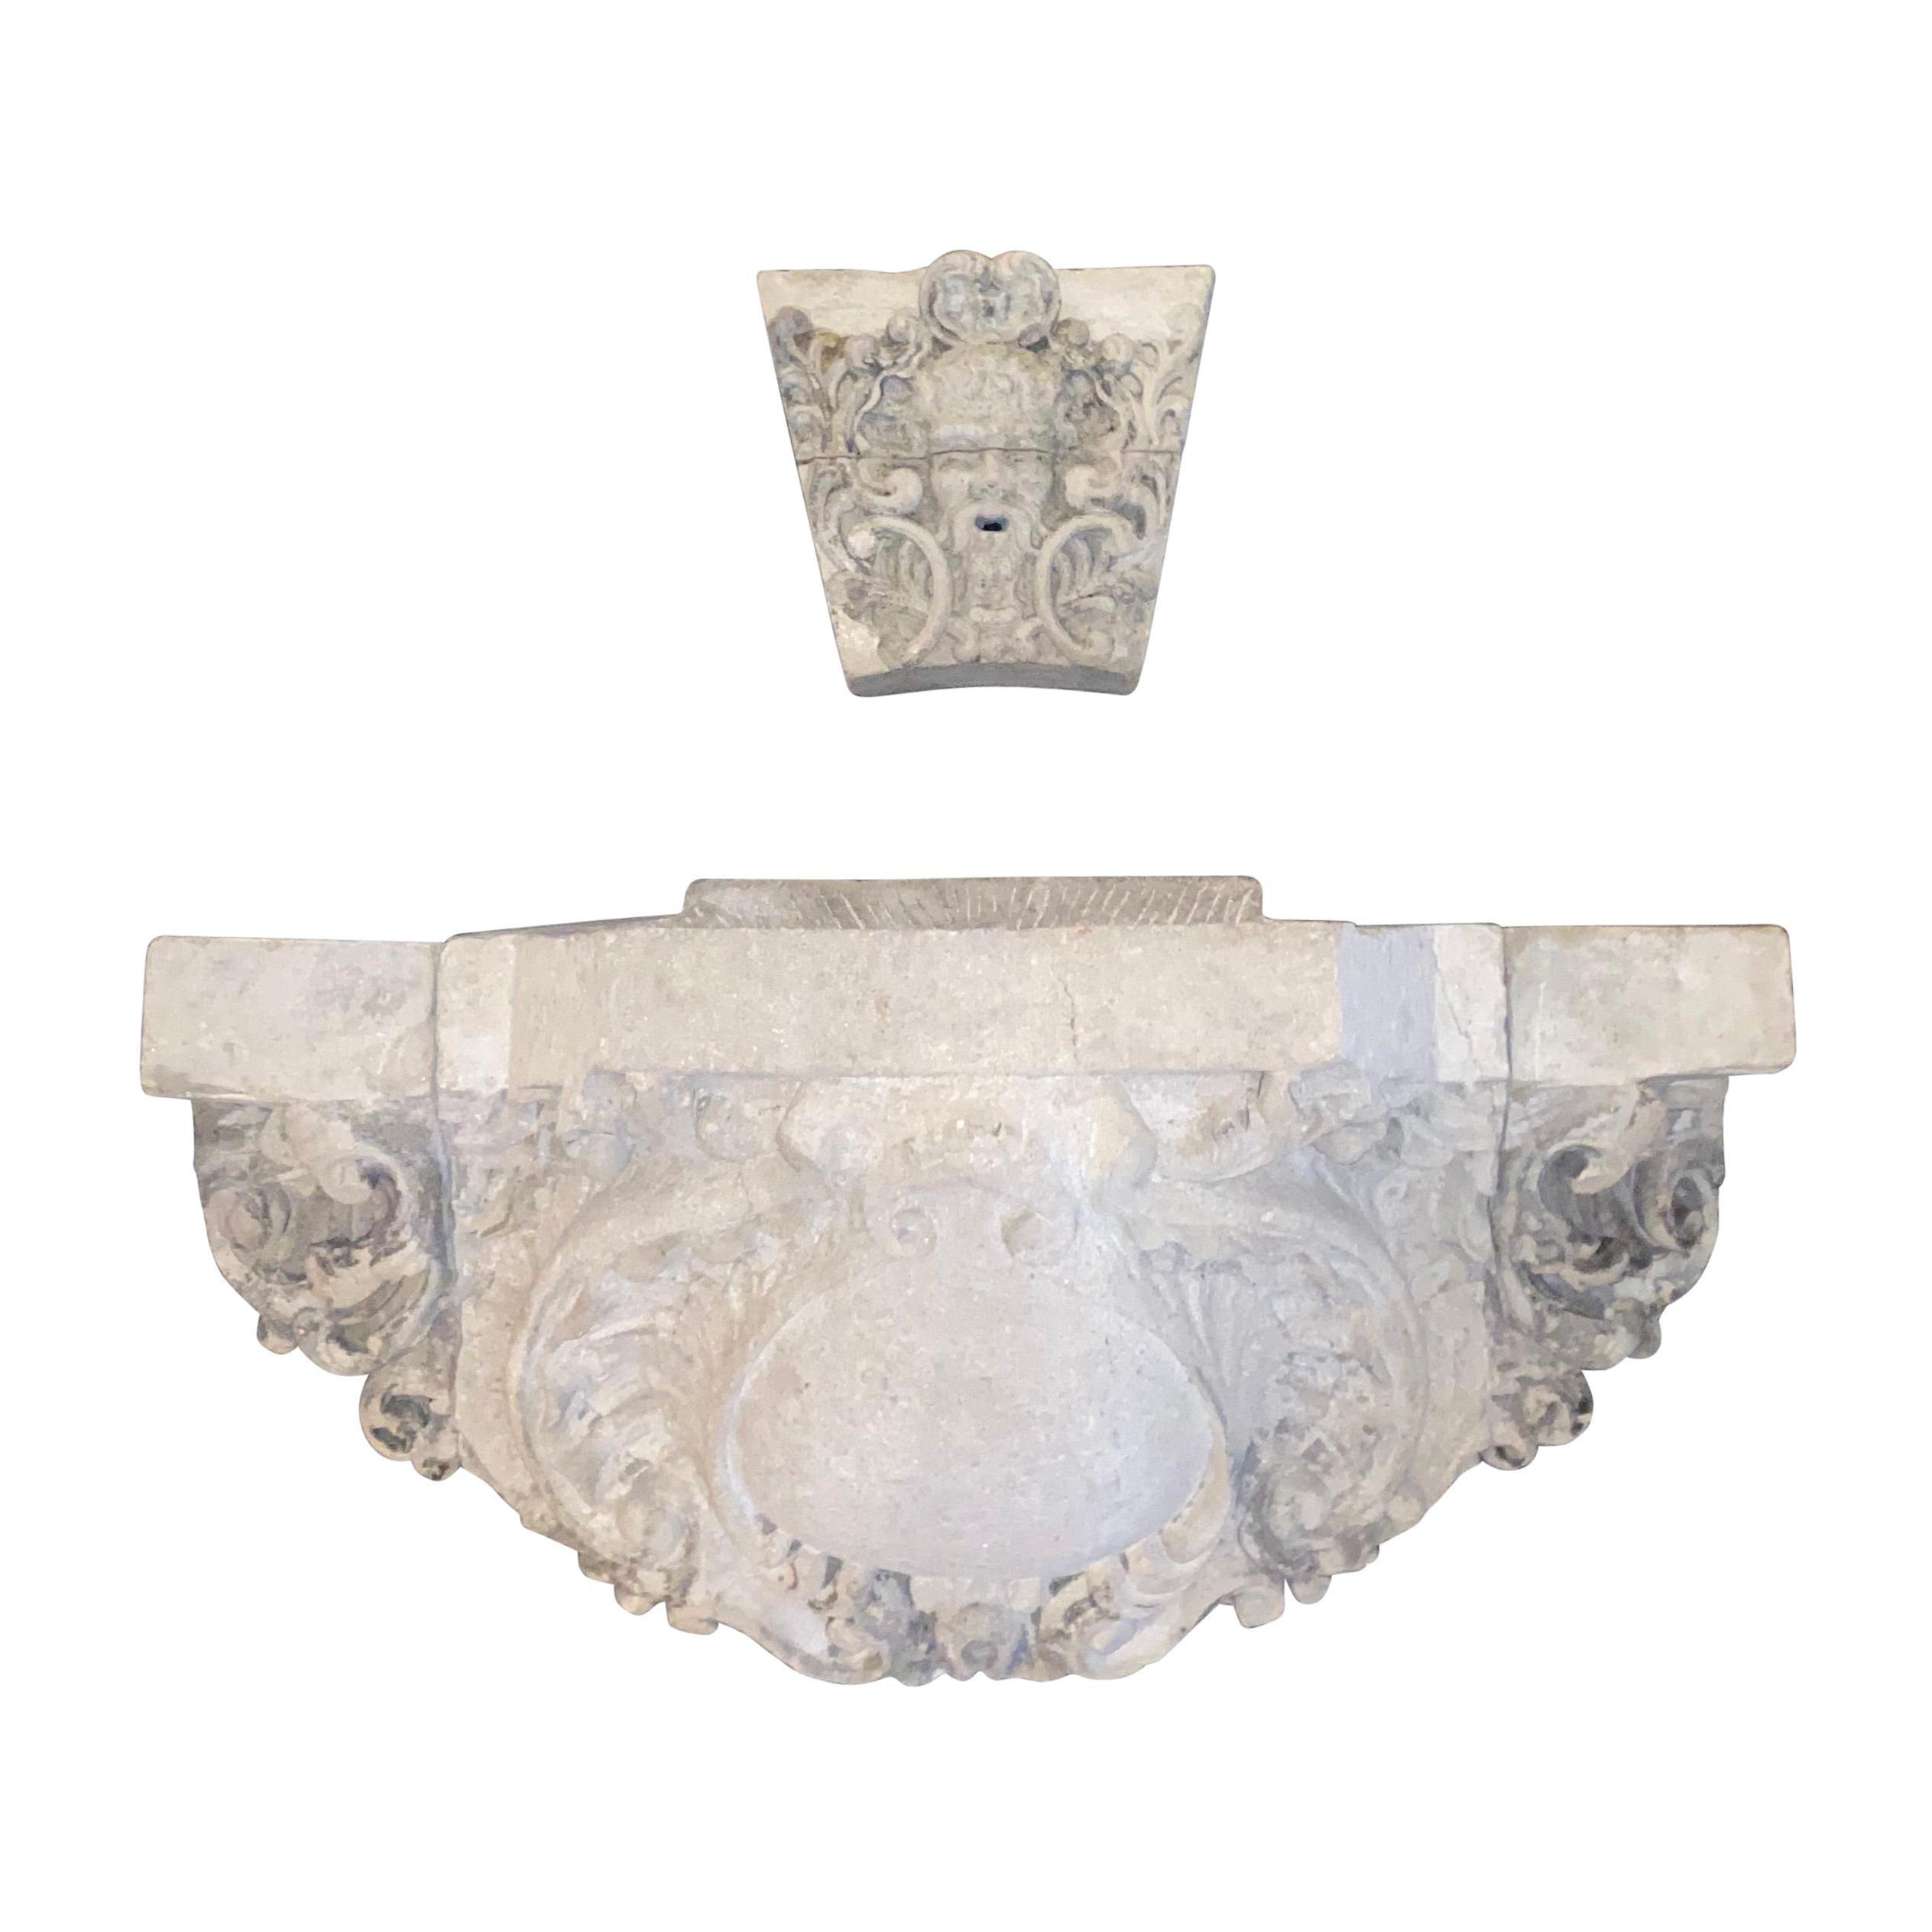 19th Century French Limestone Wall Fountain